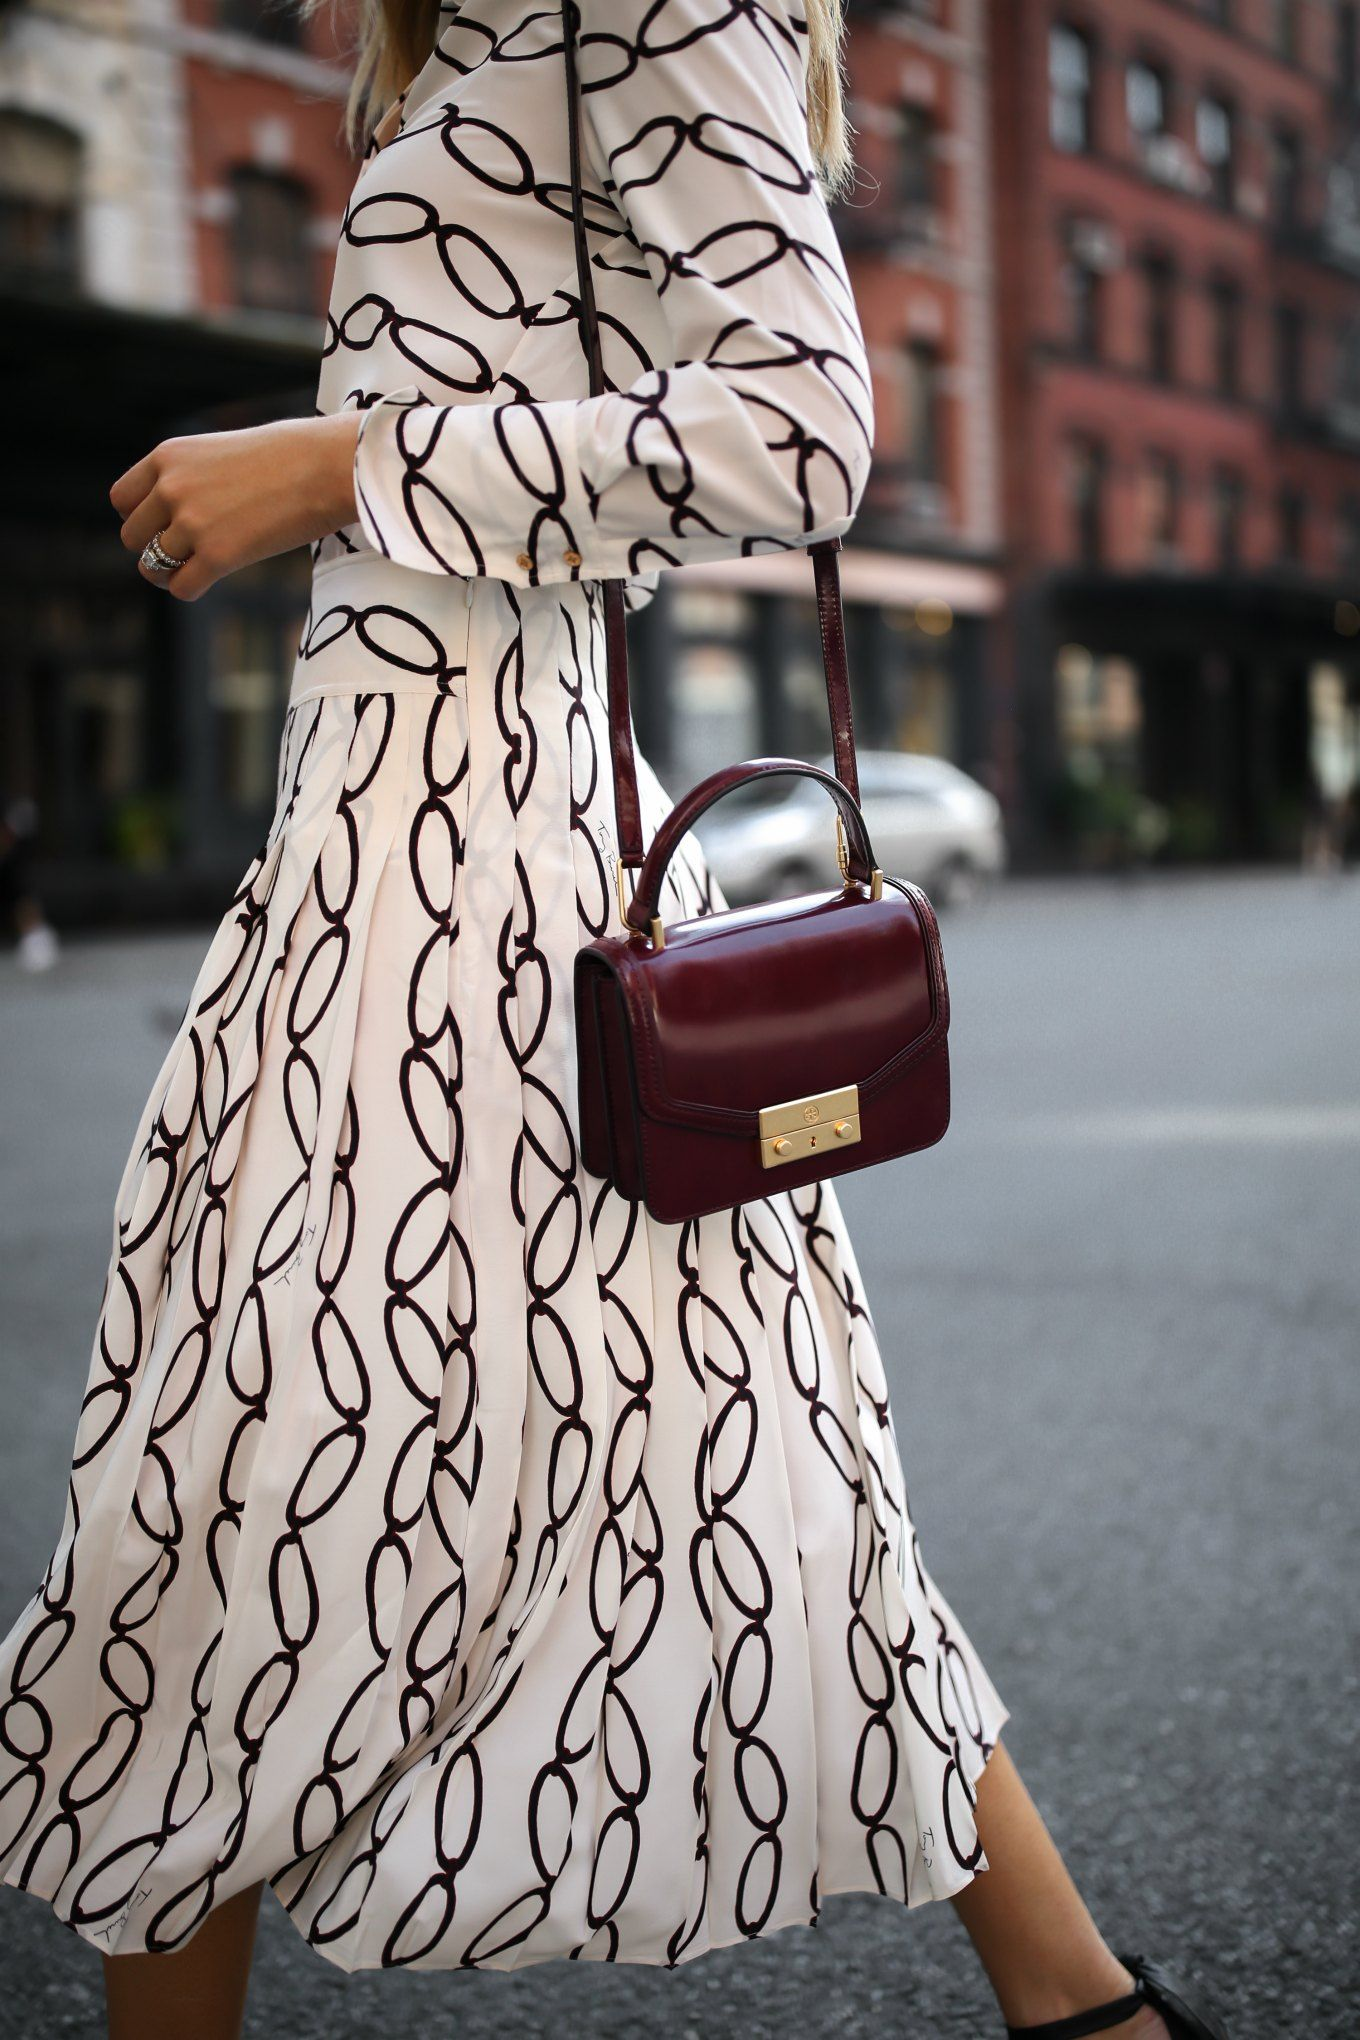 9a417af22c17 burgundy tory burch juliette bag black and white pleated midi skirt chain  print shirt black alexandre birman ankle strap bow sandals nyc style  fashion ...